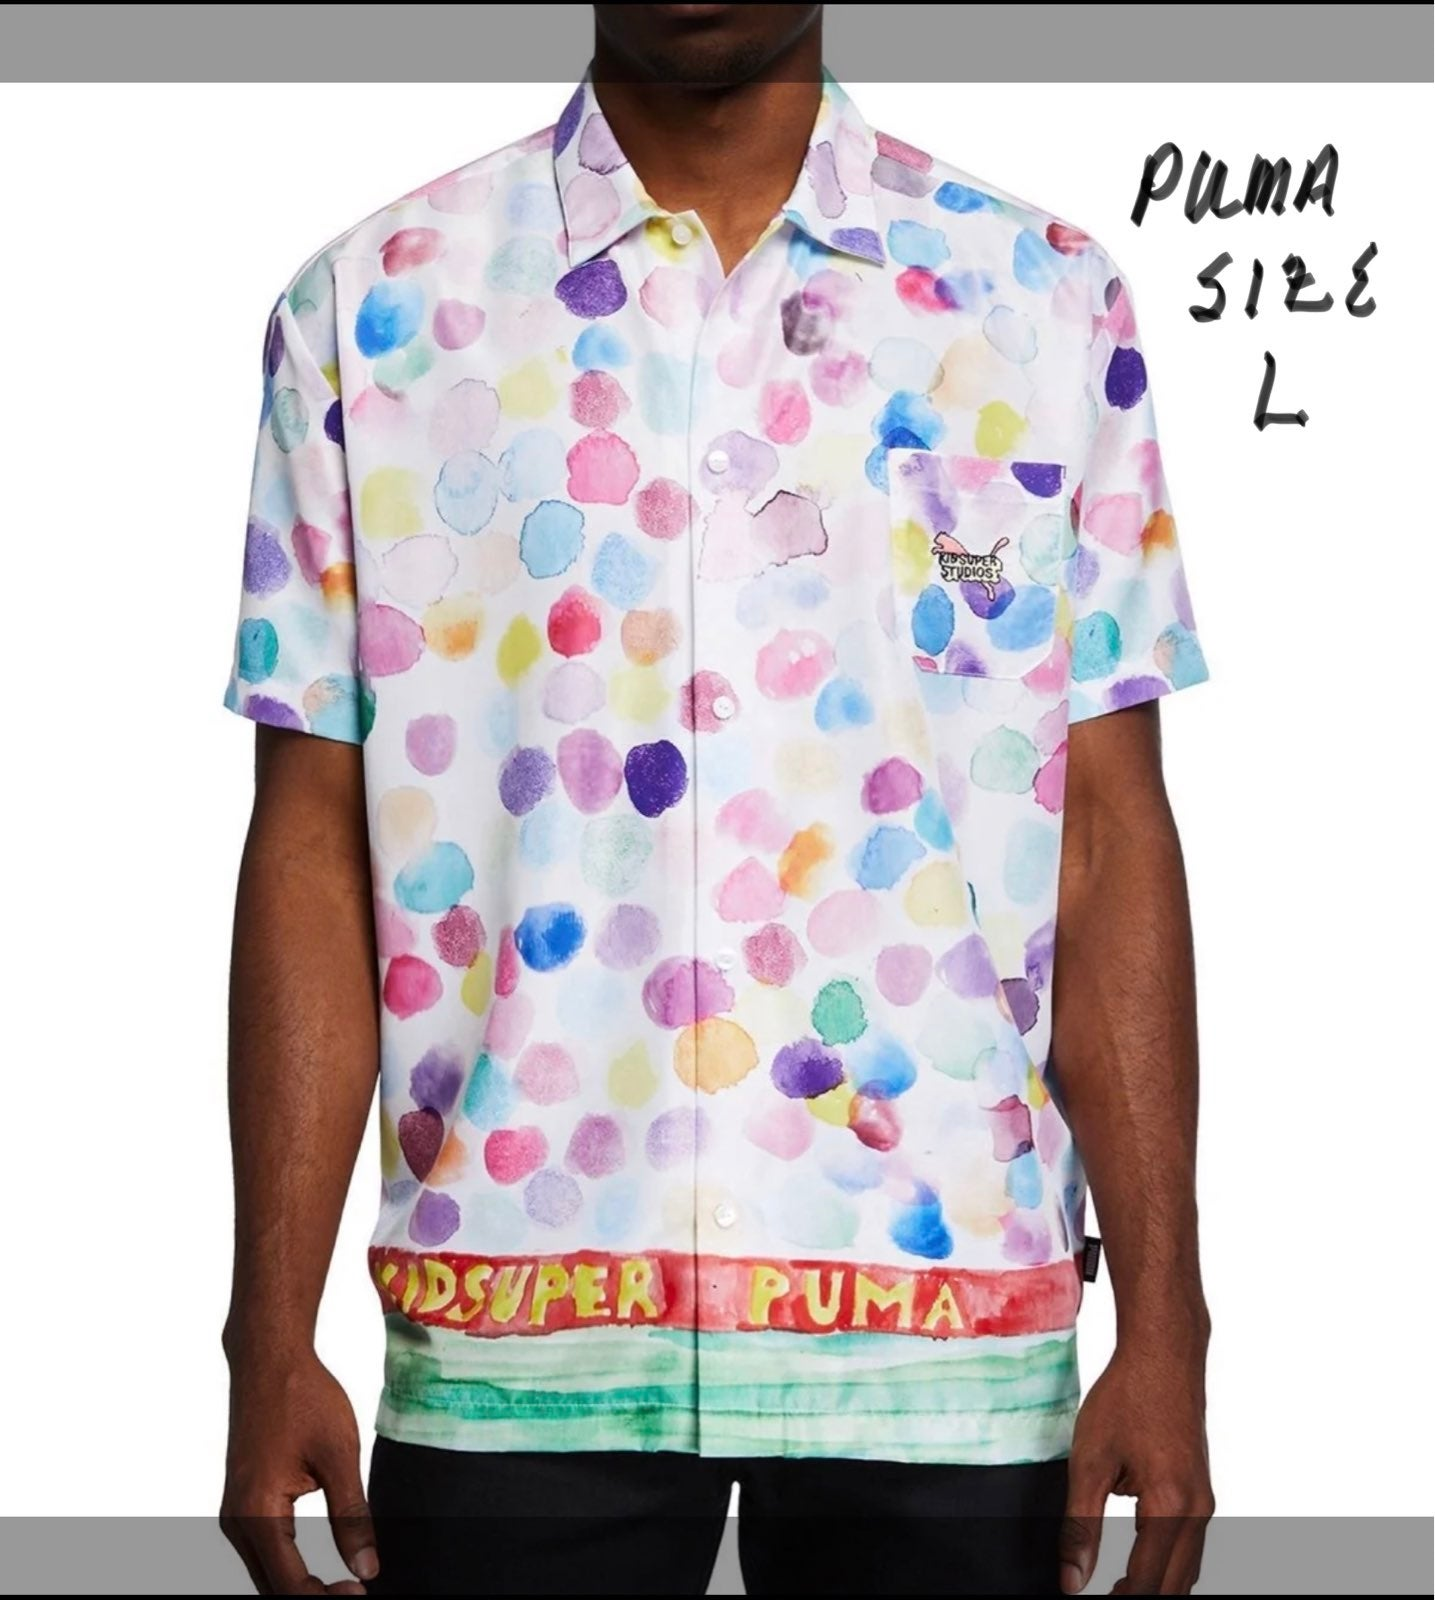 NWT Puma x KidSuper Graphic Print Shirt